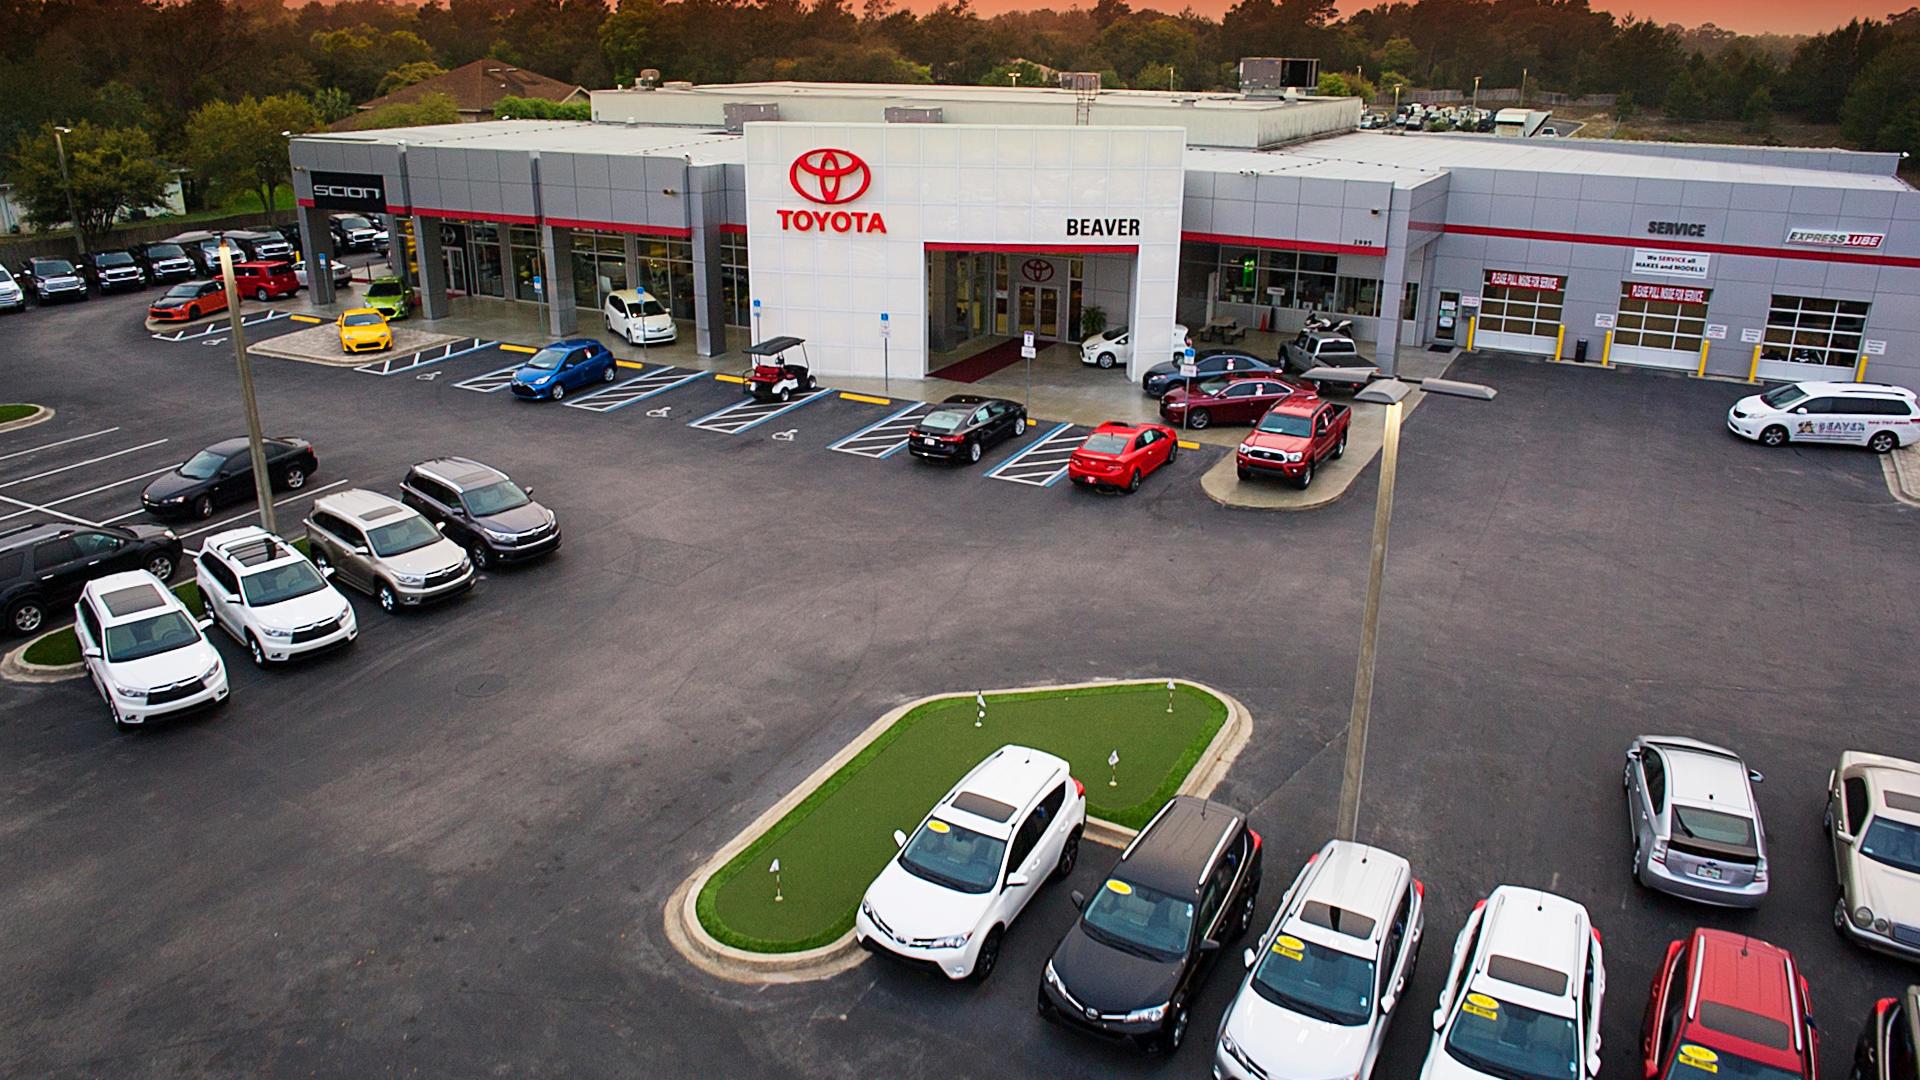 Wonderful Beaver Toyota St. Augustine 2995 US Highway 1 S St Augustine, FL Car  Service   MapQuest